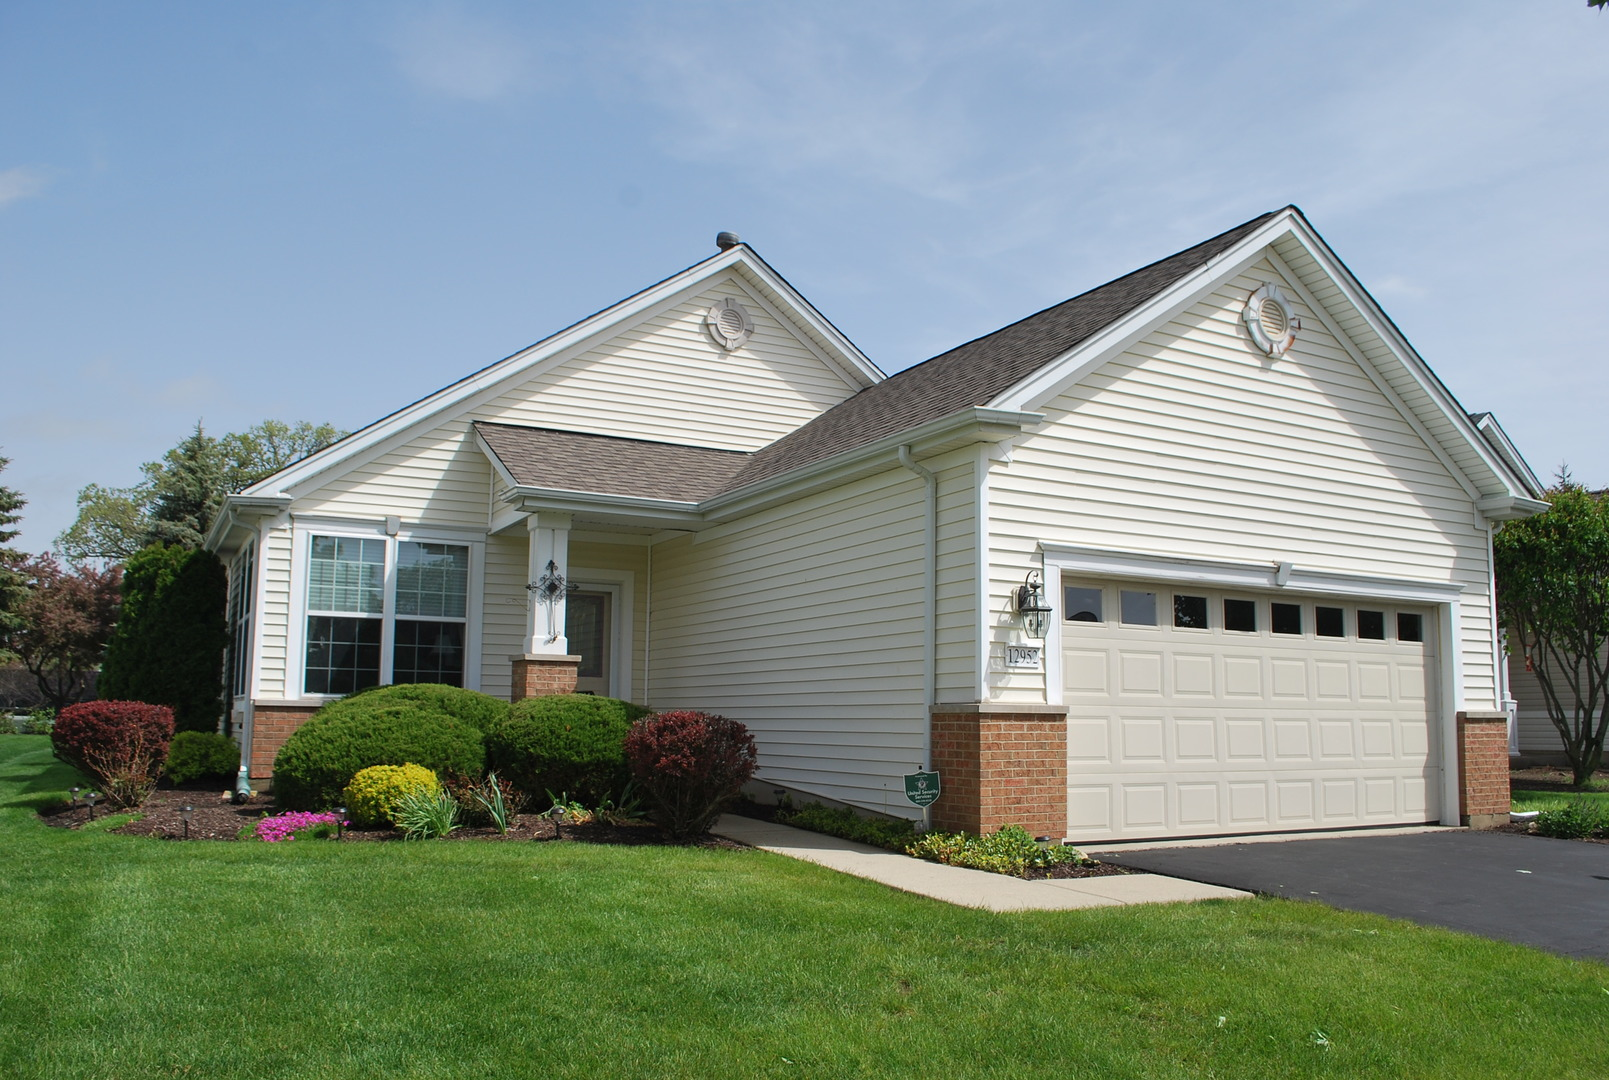 12952 Wisconsin Circle, Huntley, IL 60142